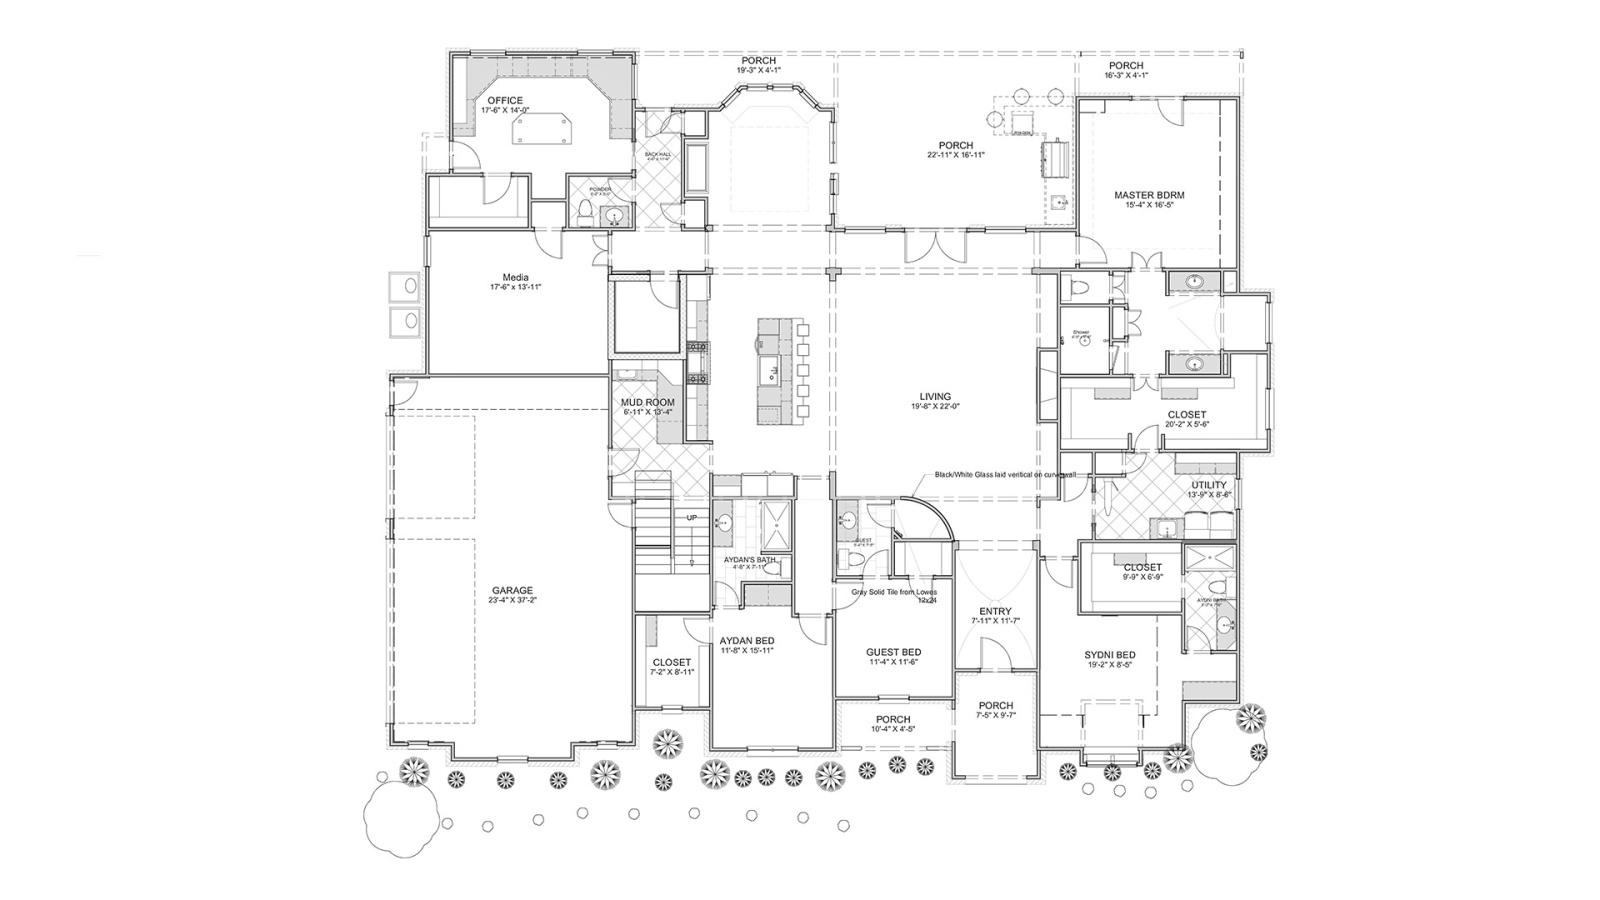 4 Bedrooms Bedrooms, ,5 BathroomsBathrooms,Custom Home,Home Plans,1027